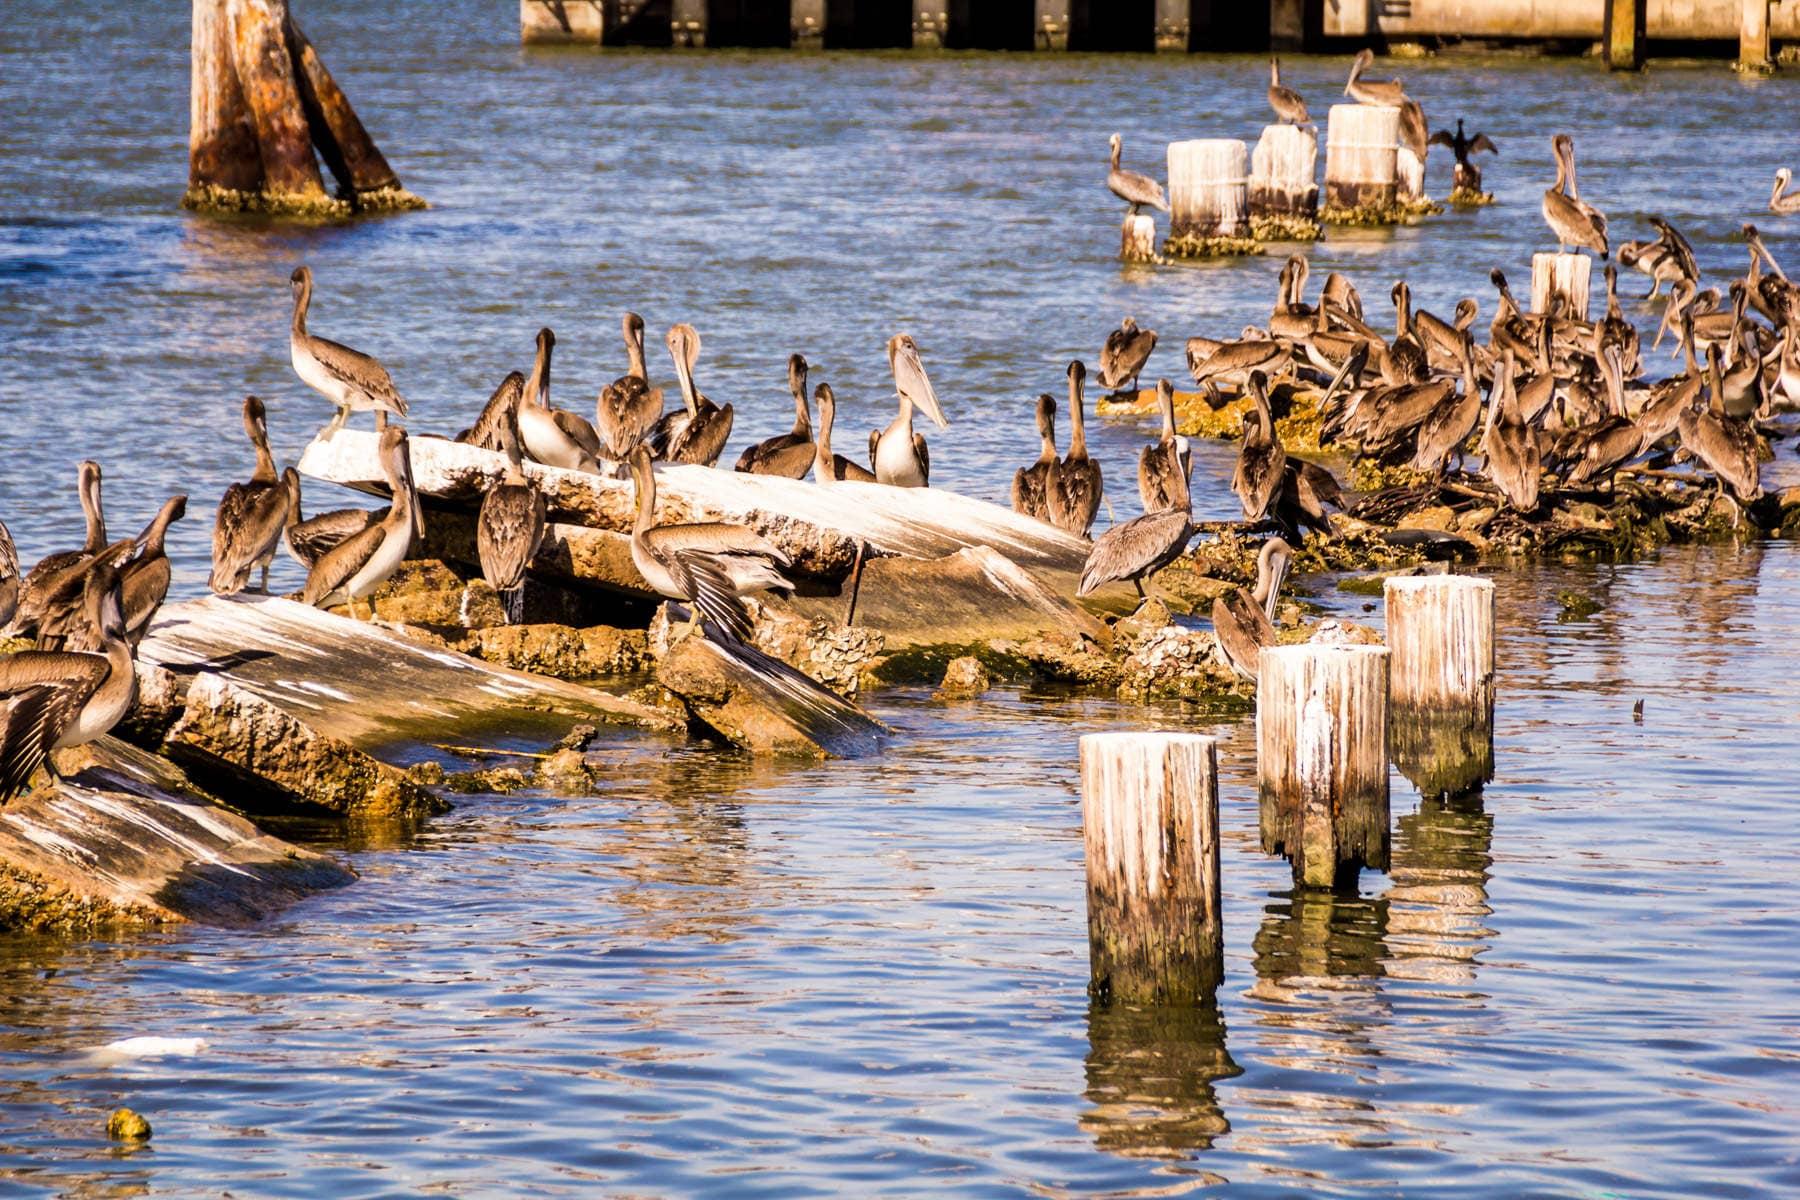 A flock of pelicans in Galveston, Texas.